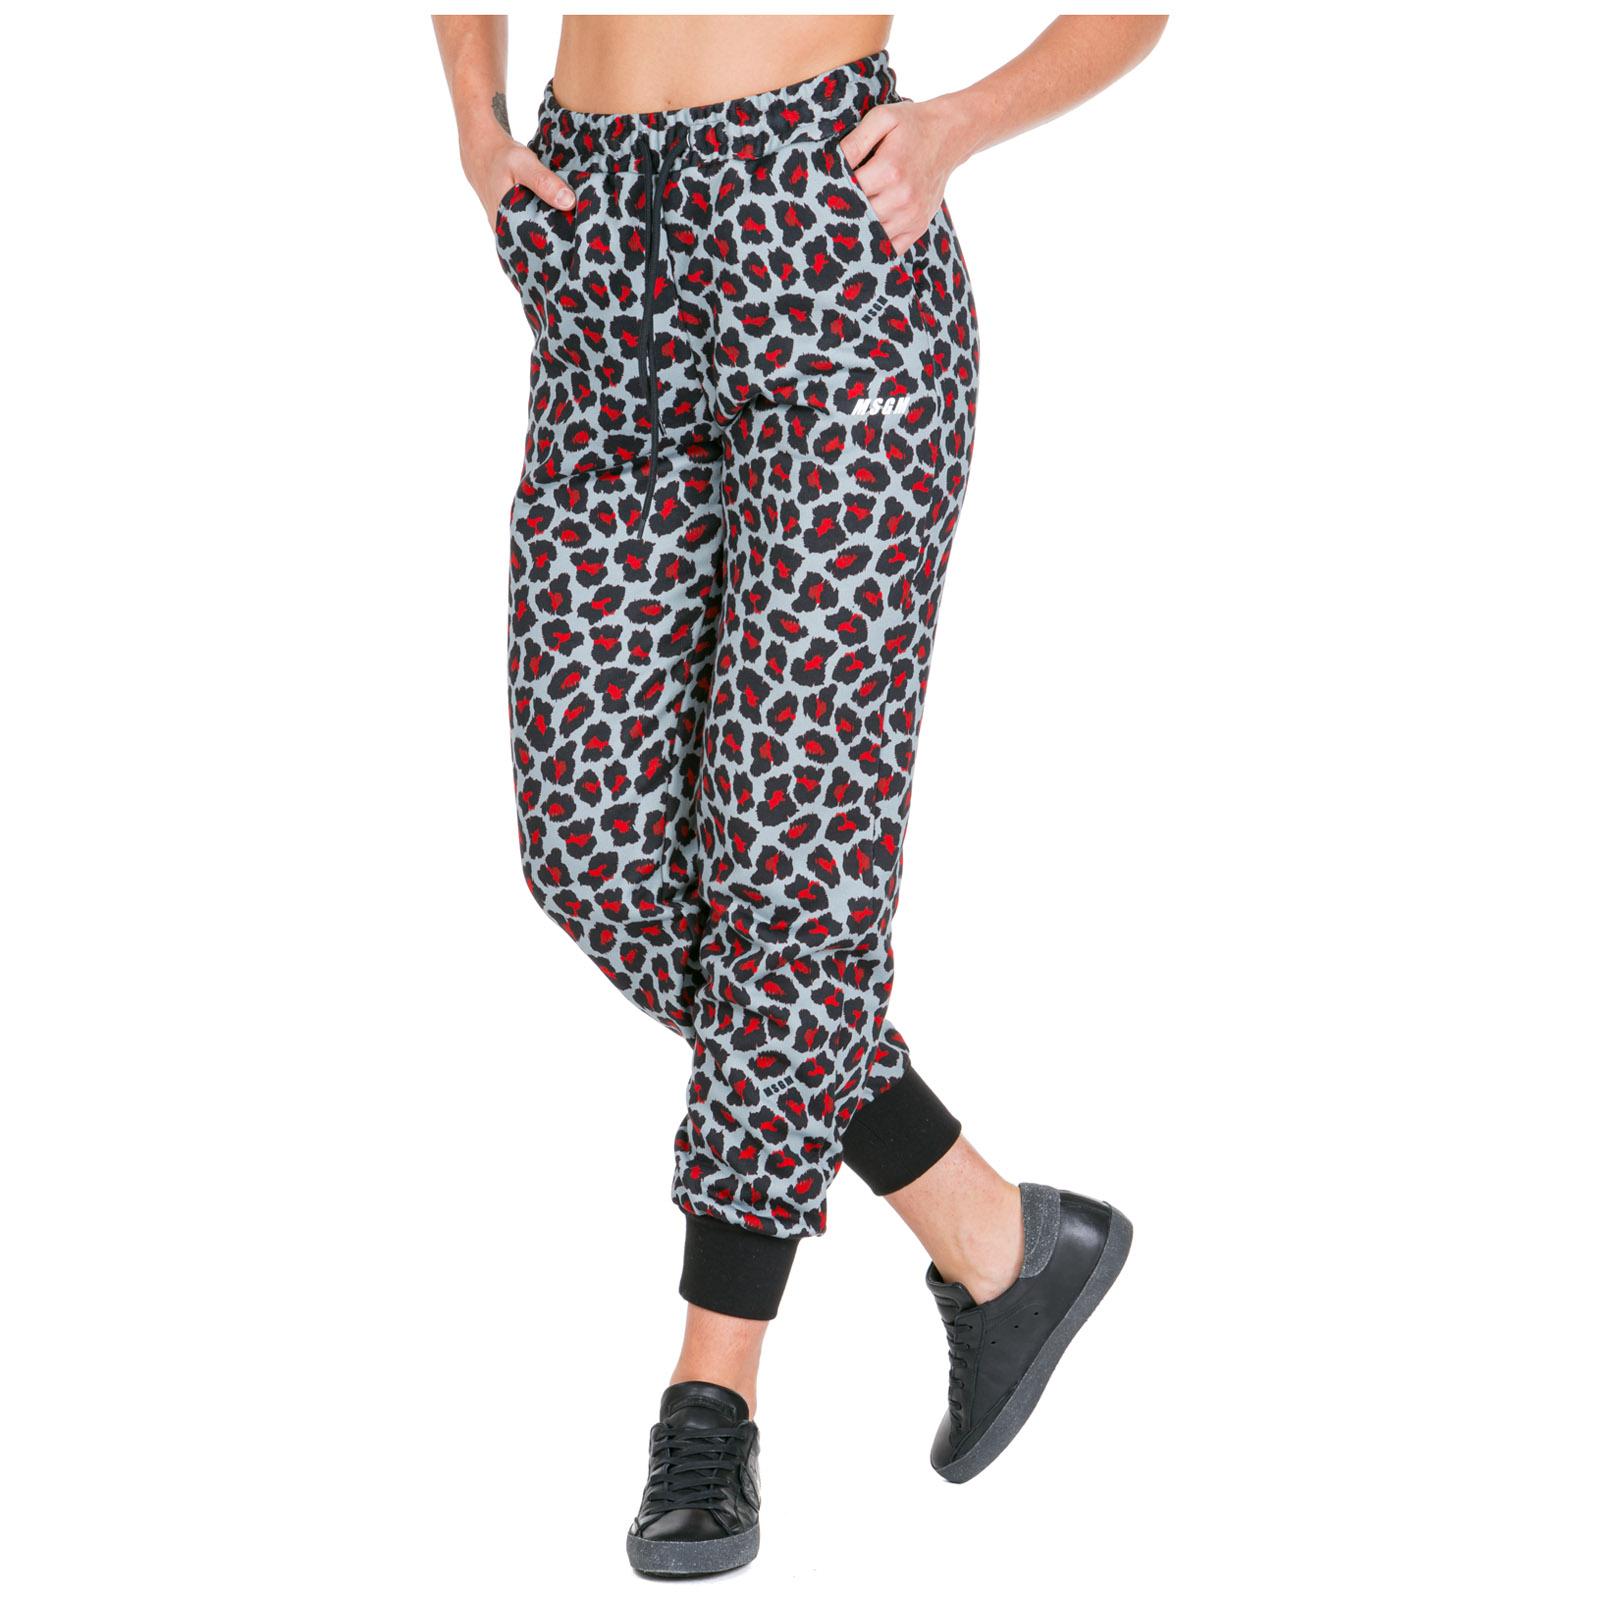 Msgm Pants Women's sport tracksuit trousers